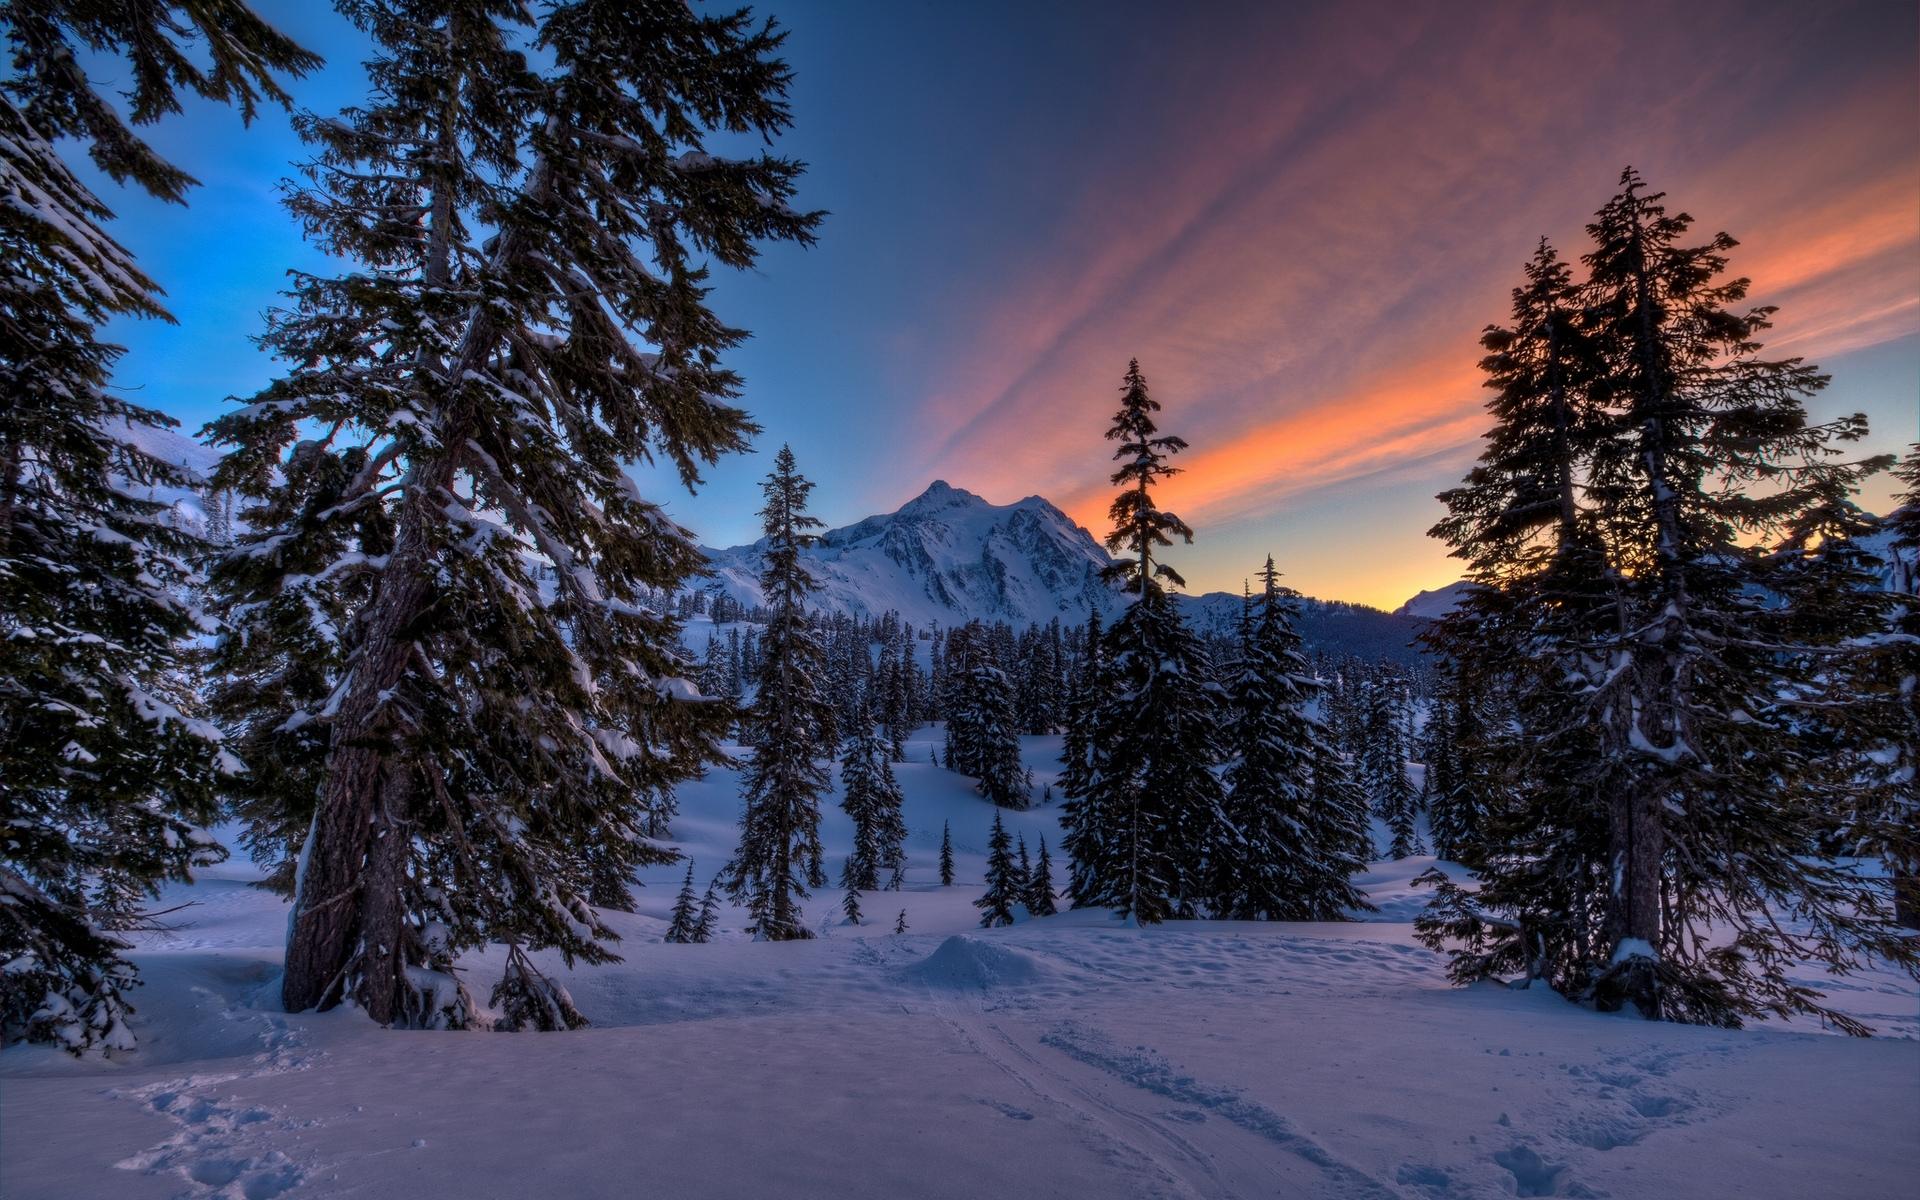 Snowy pine trees wallpaper 29595 1920x1200